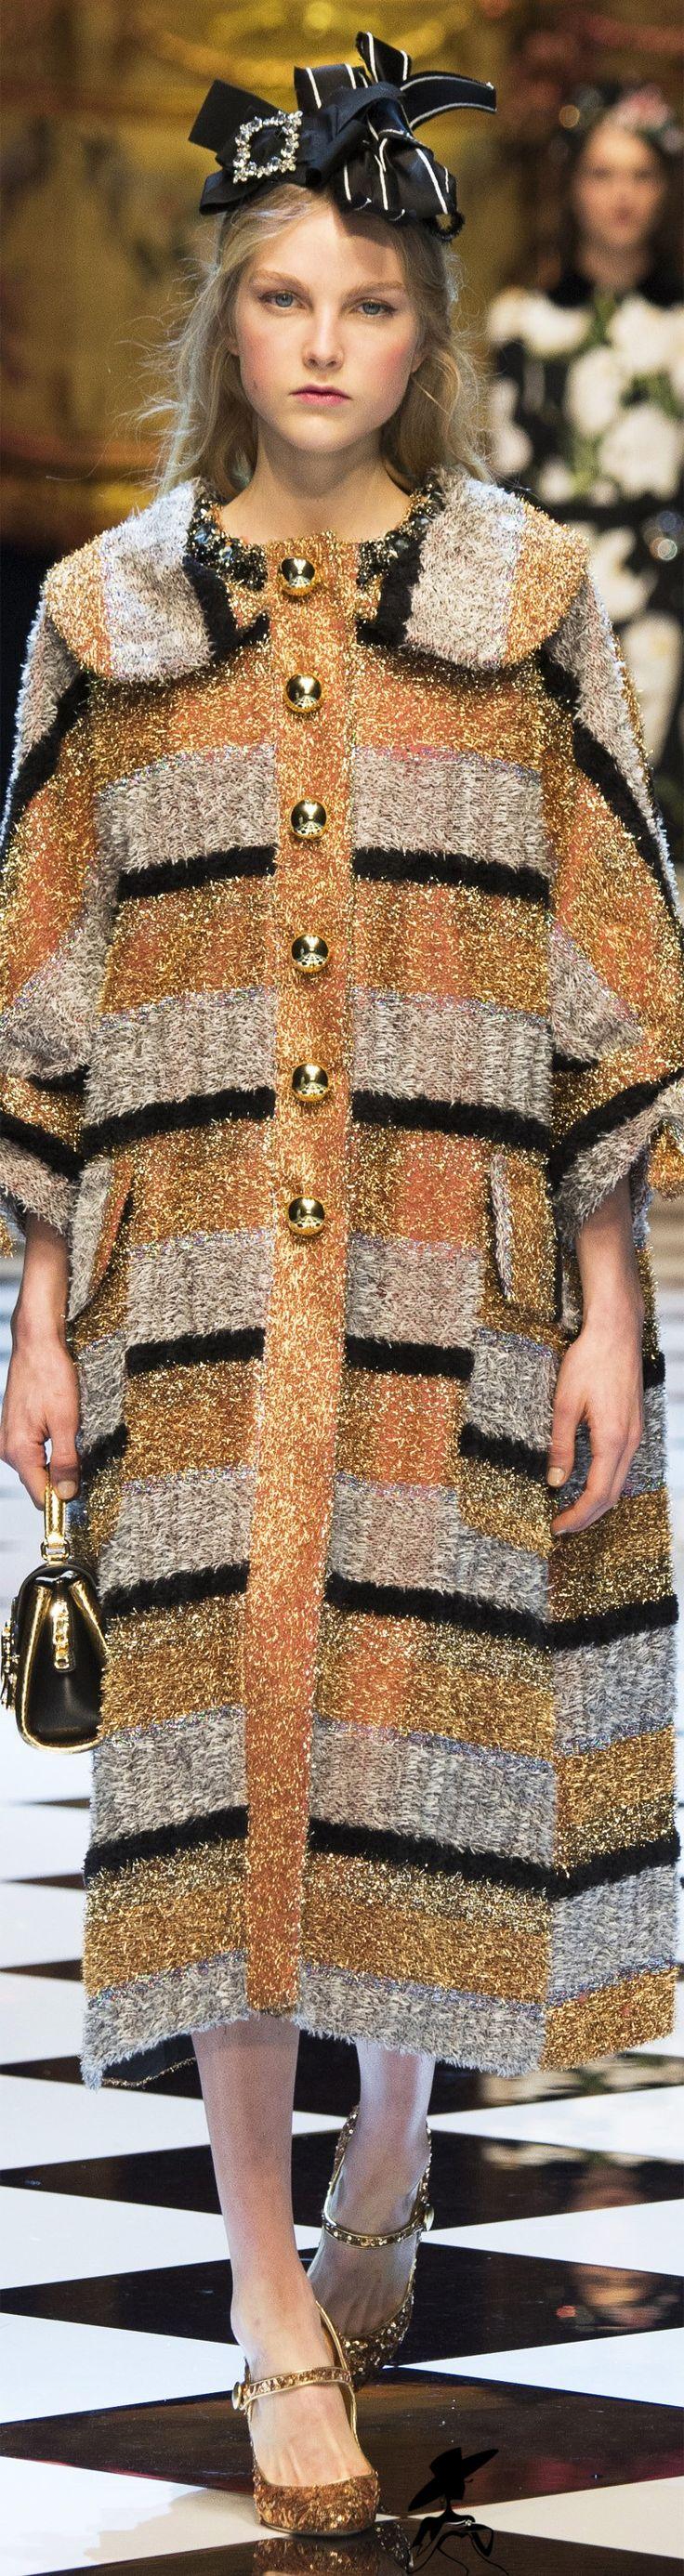 Dolce and Gabbana fall 2016